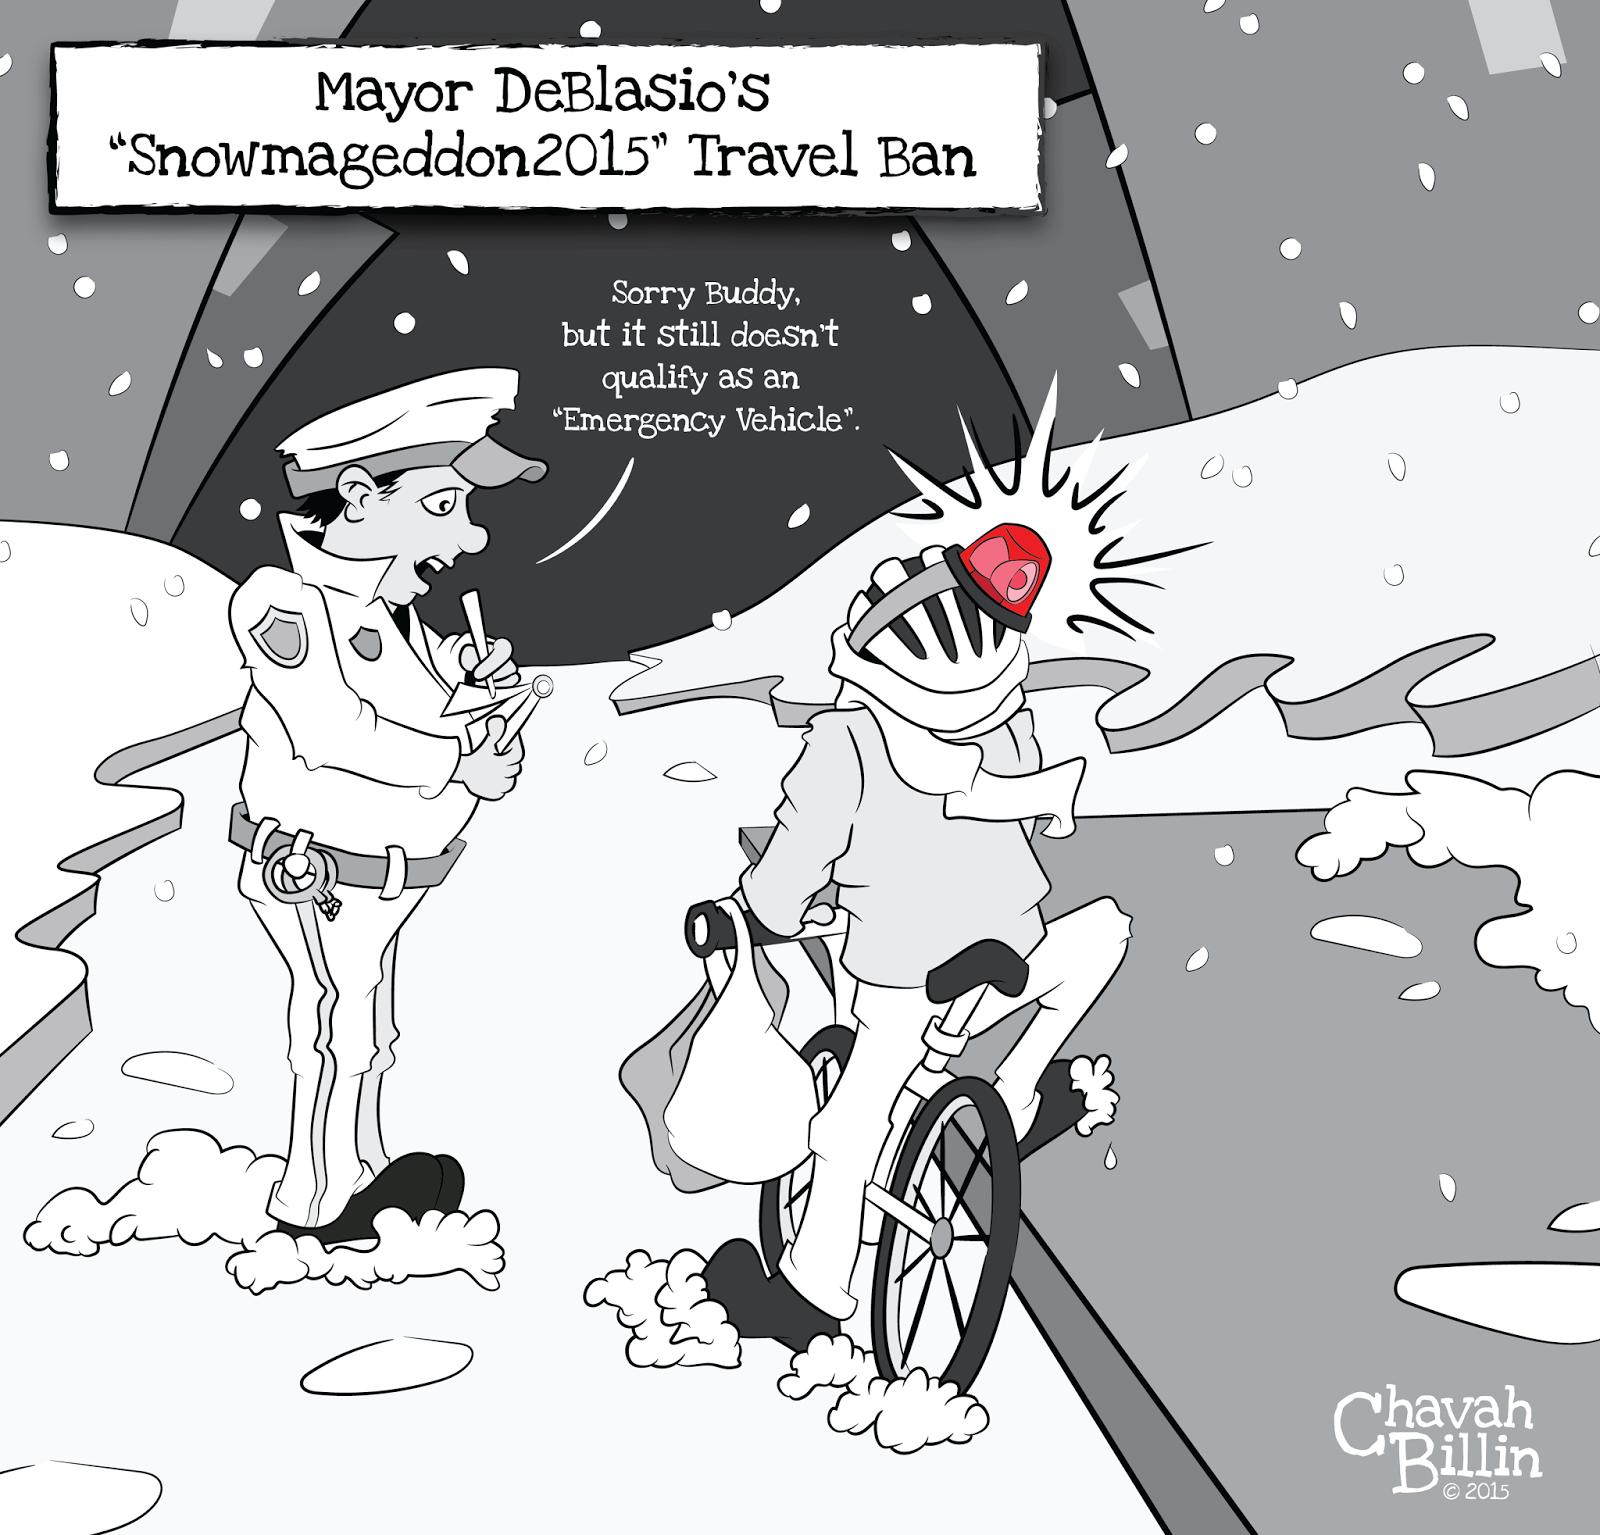 Mayor DeBlasio's Snowmageddon 2015 Travel Ban